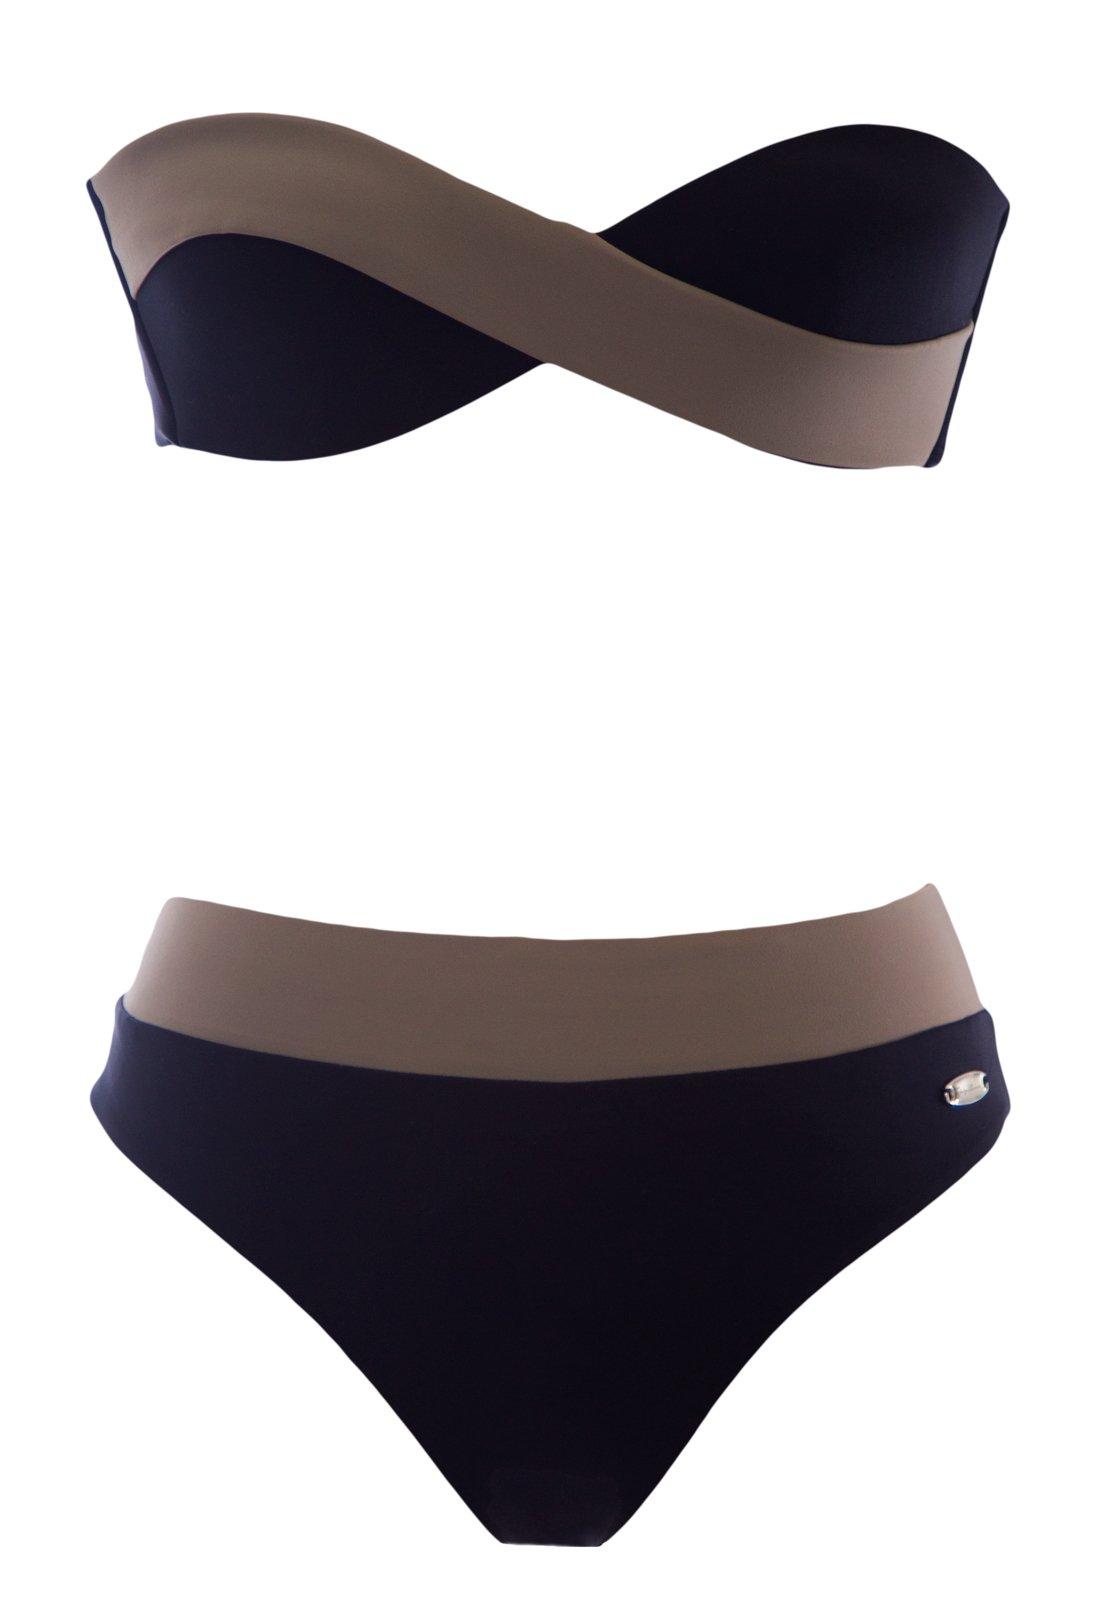 Giorgio Armani Women's Bandeau Bikini with Straps Small Black and Taupe